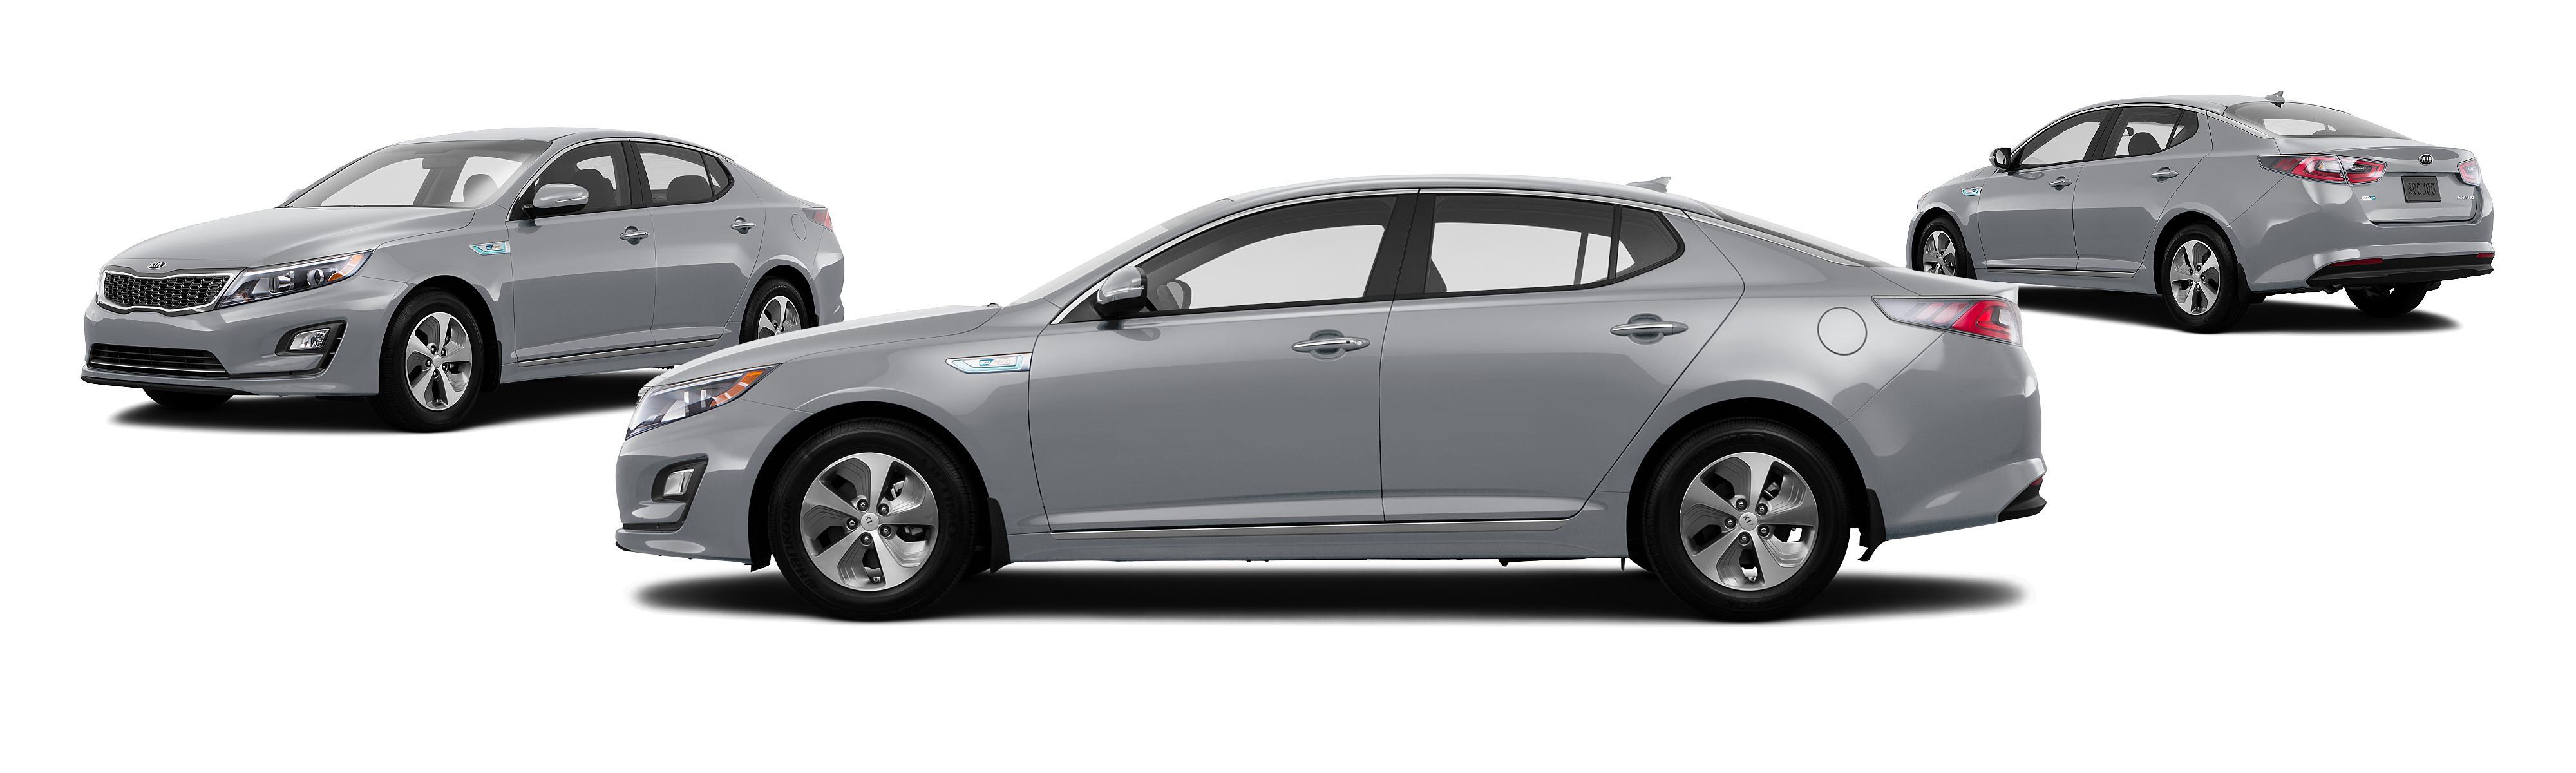 kia models vancouver weston interior portland beaverton optima hybrid